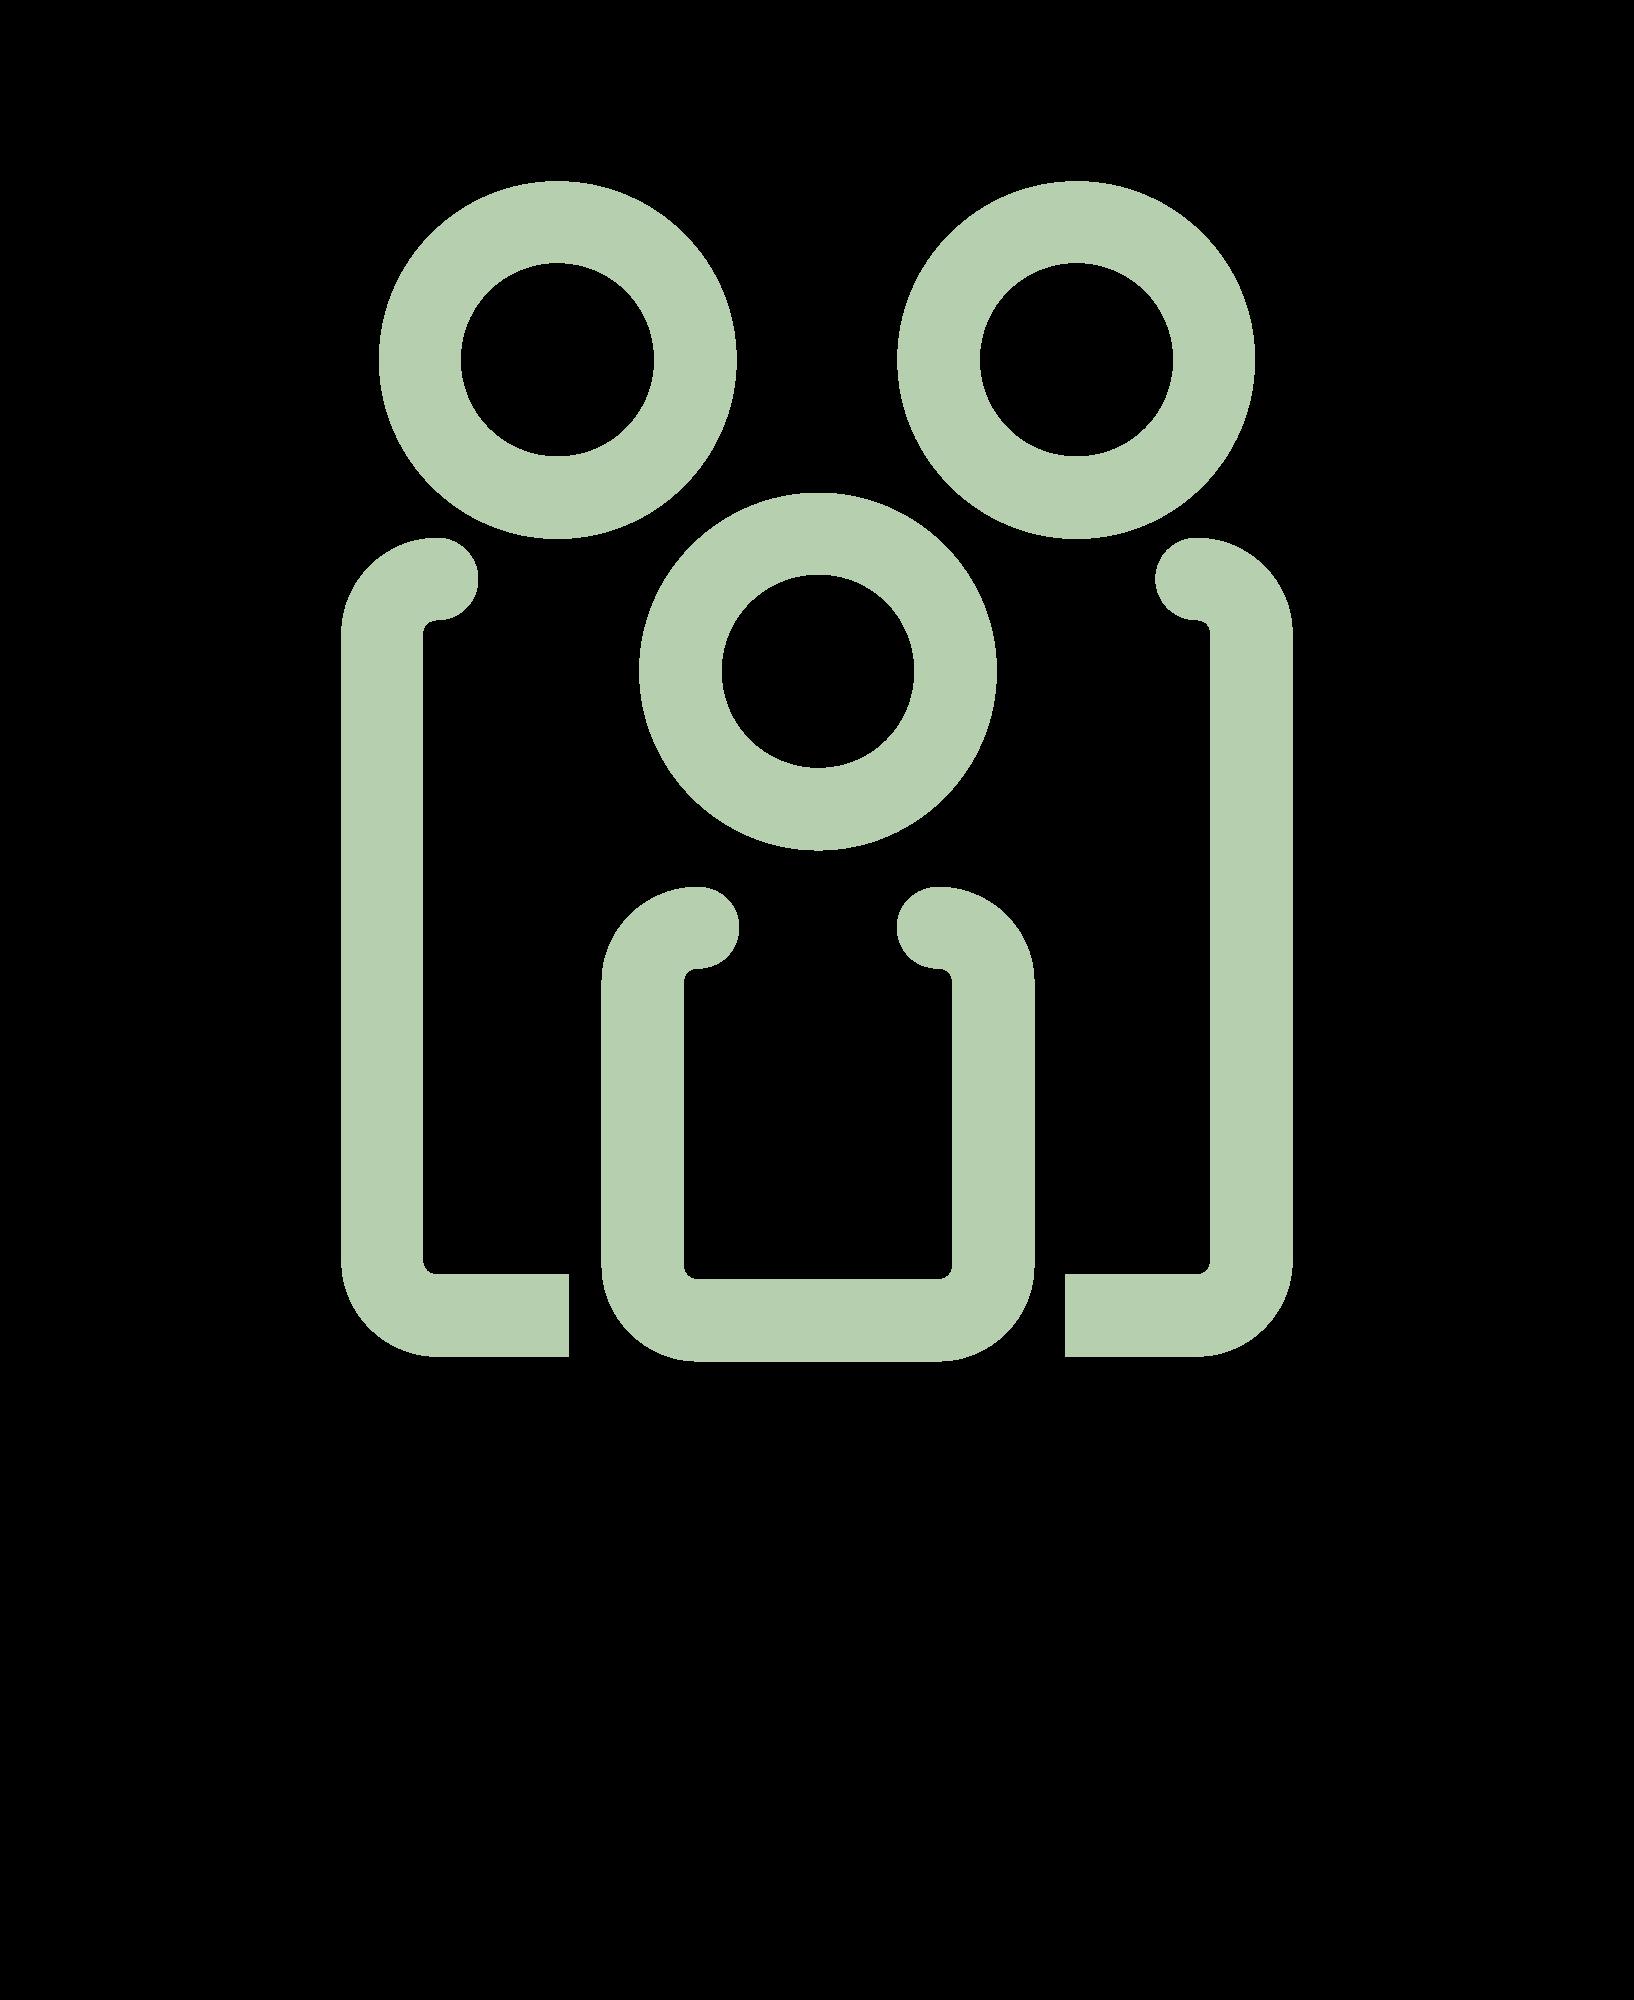 ONE BIG-logo.png